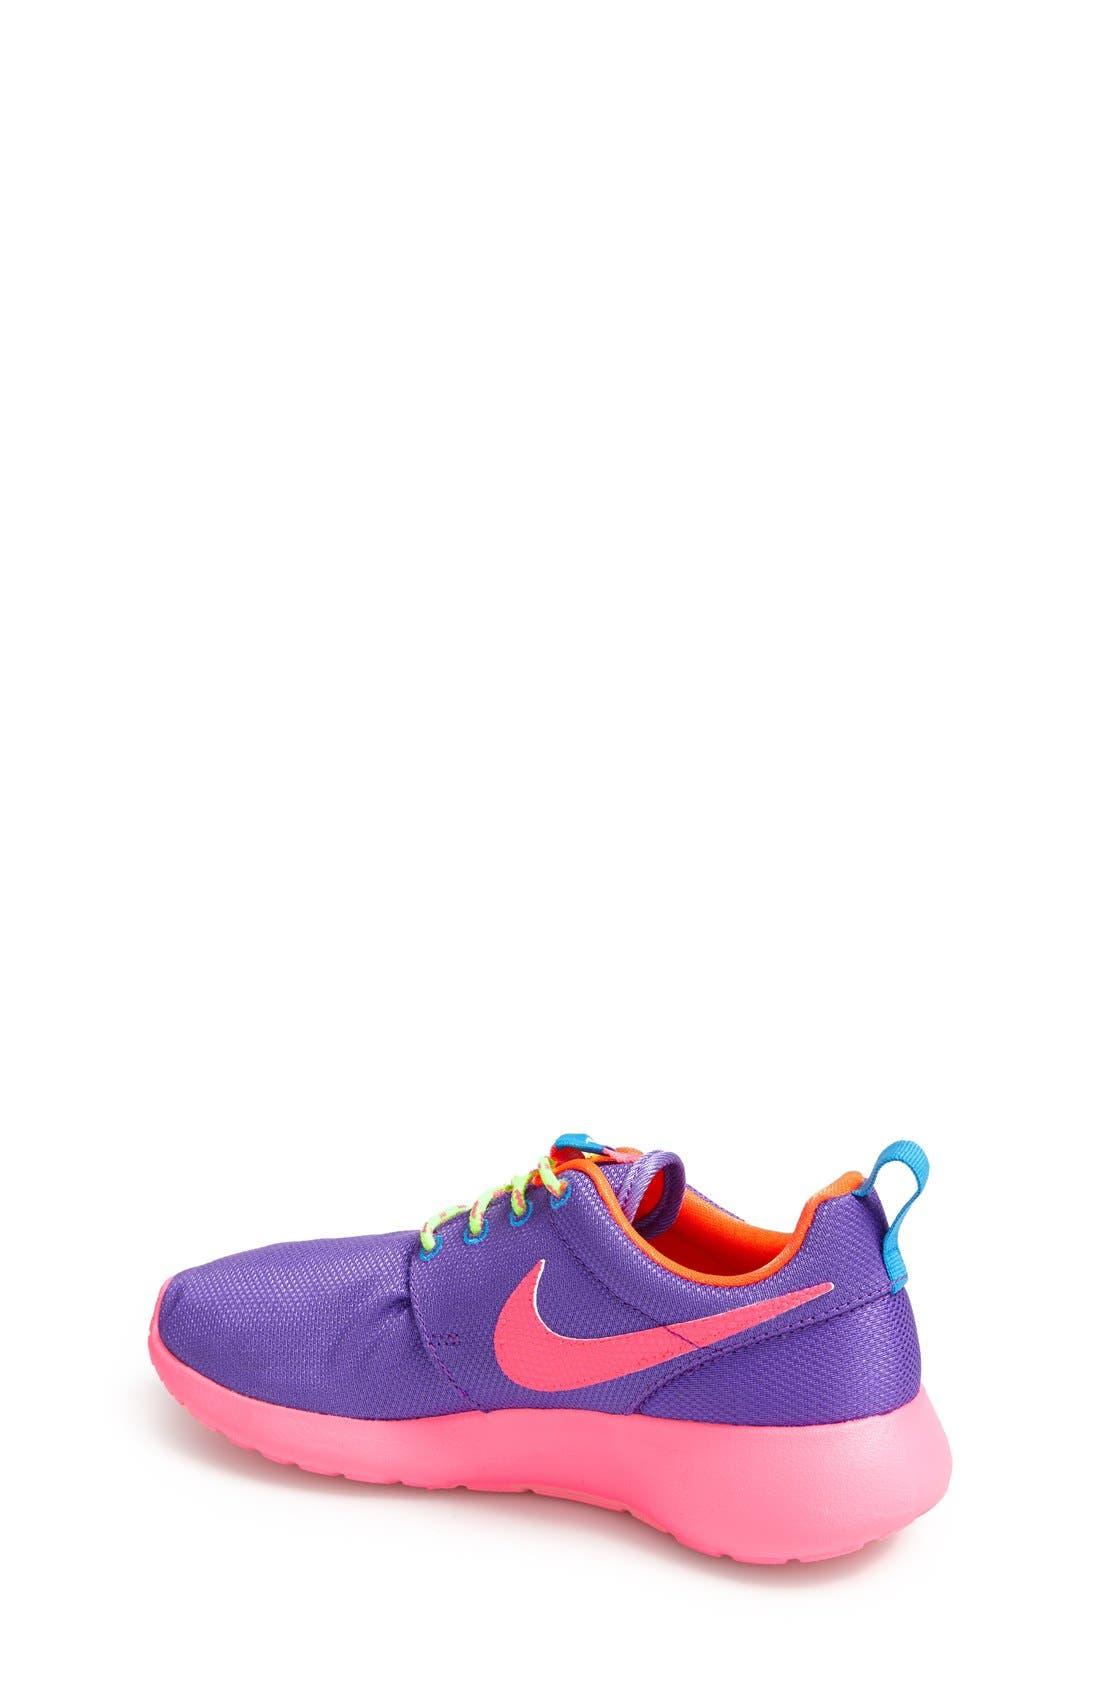 'Roshe Run' Athletic Shoe,                             Alternate thumbnail 136, color,